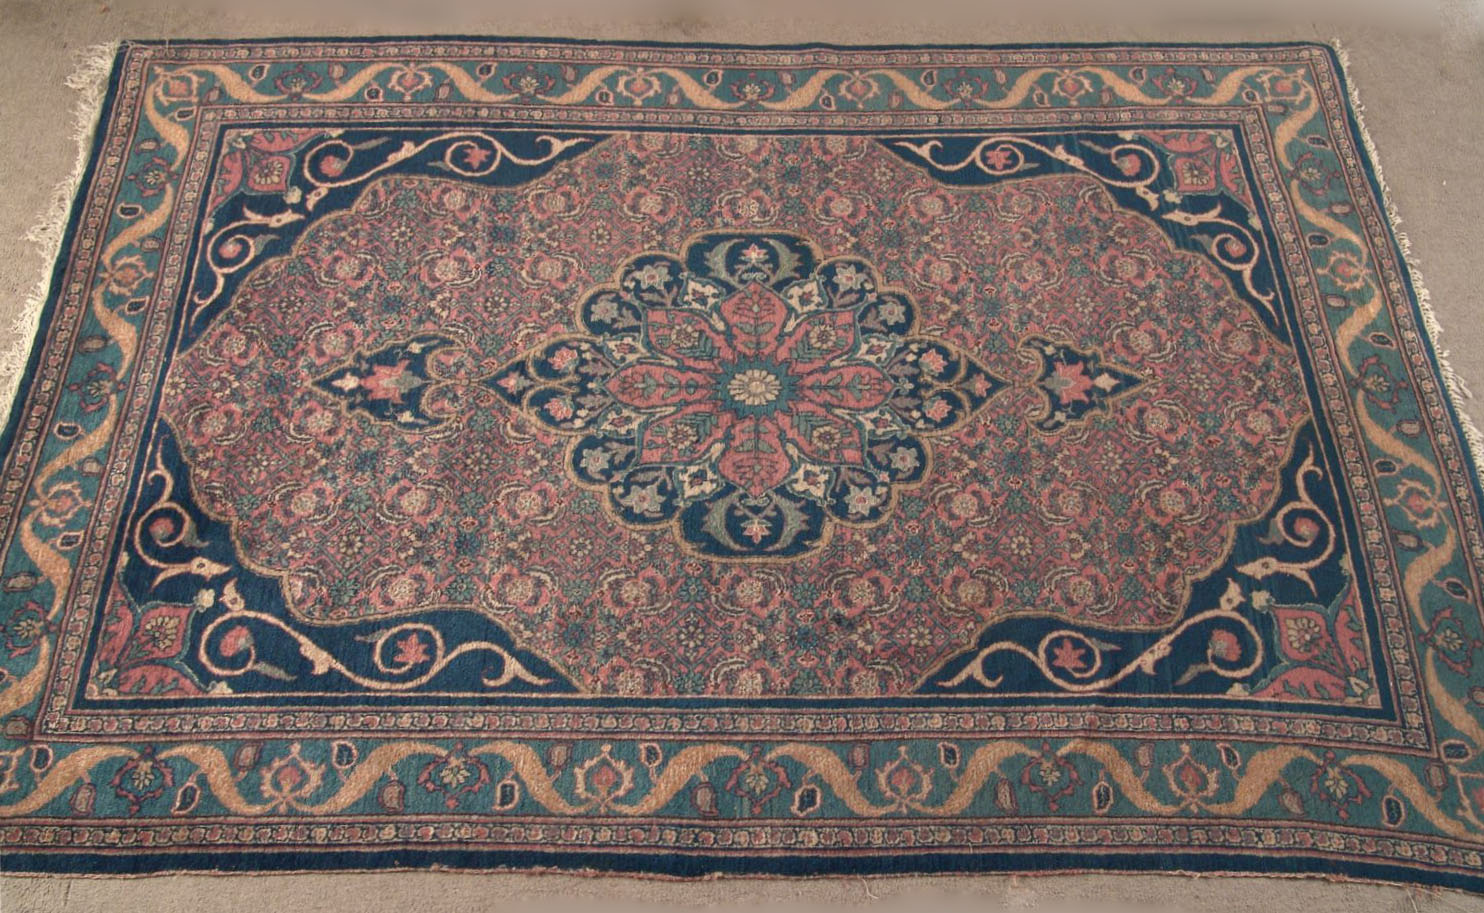 Bgw remate 187 alfombra gek htm gendata for Alfombra persa azul